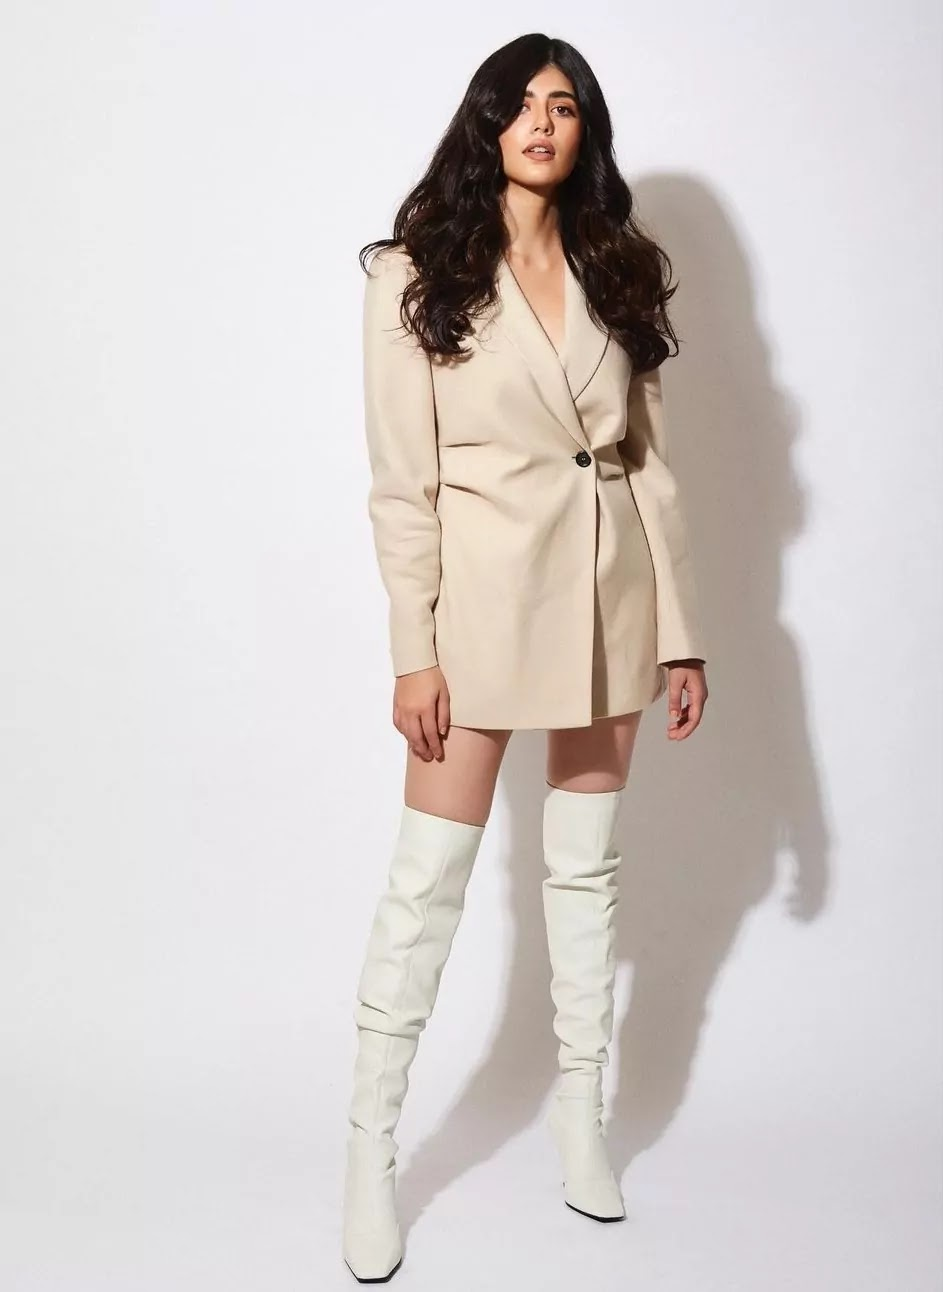 sanjana-sanghi-off-white-blazer-dress